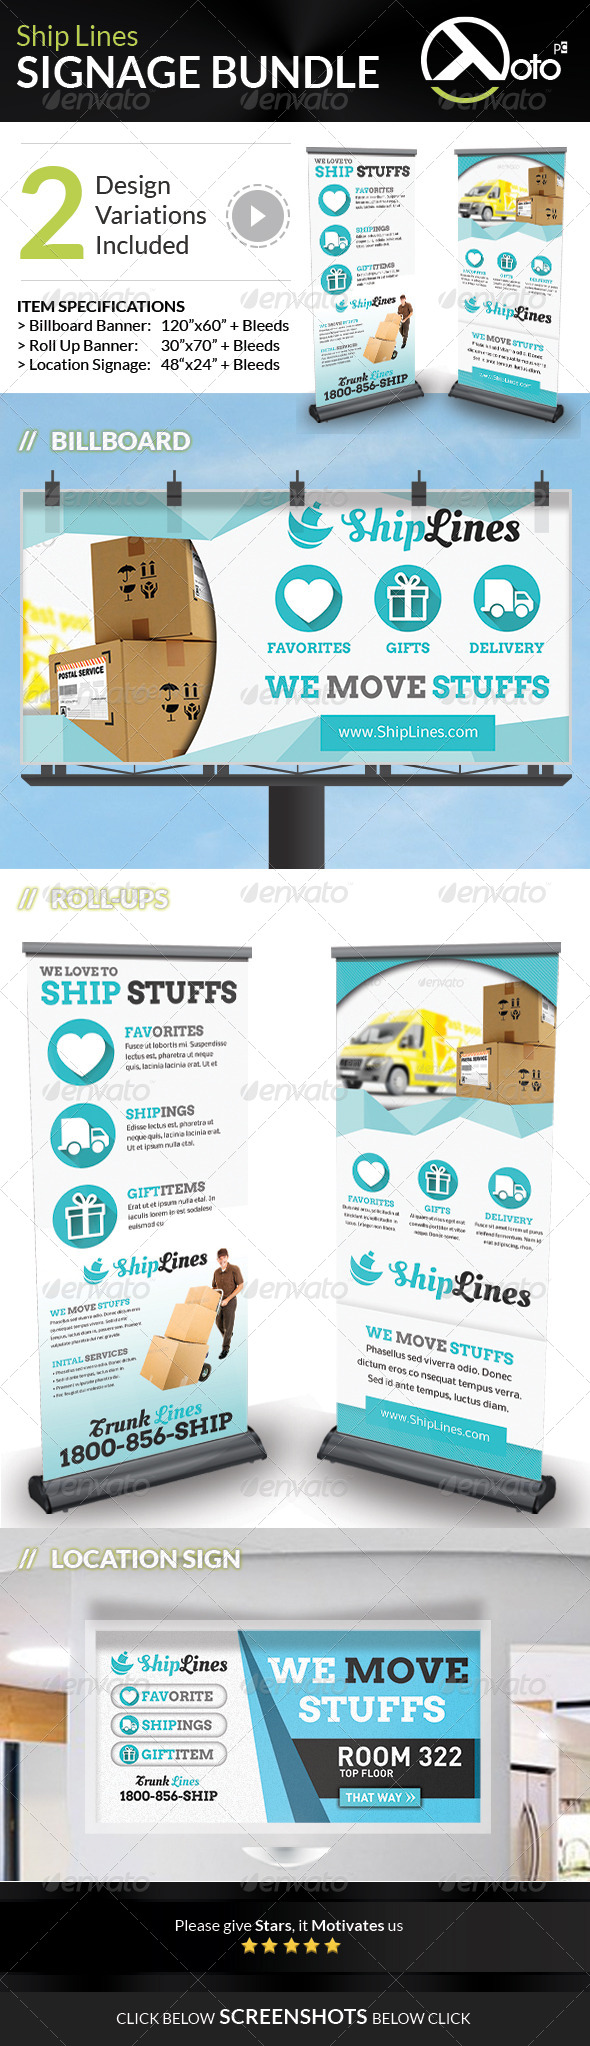 GraphicRiver Ship Lines Shipping Service Signage Bundle 7641636